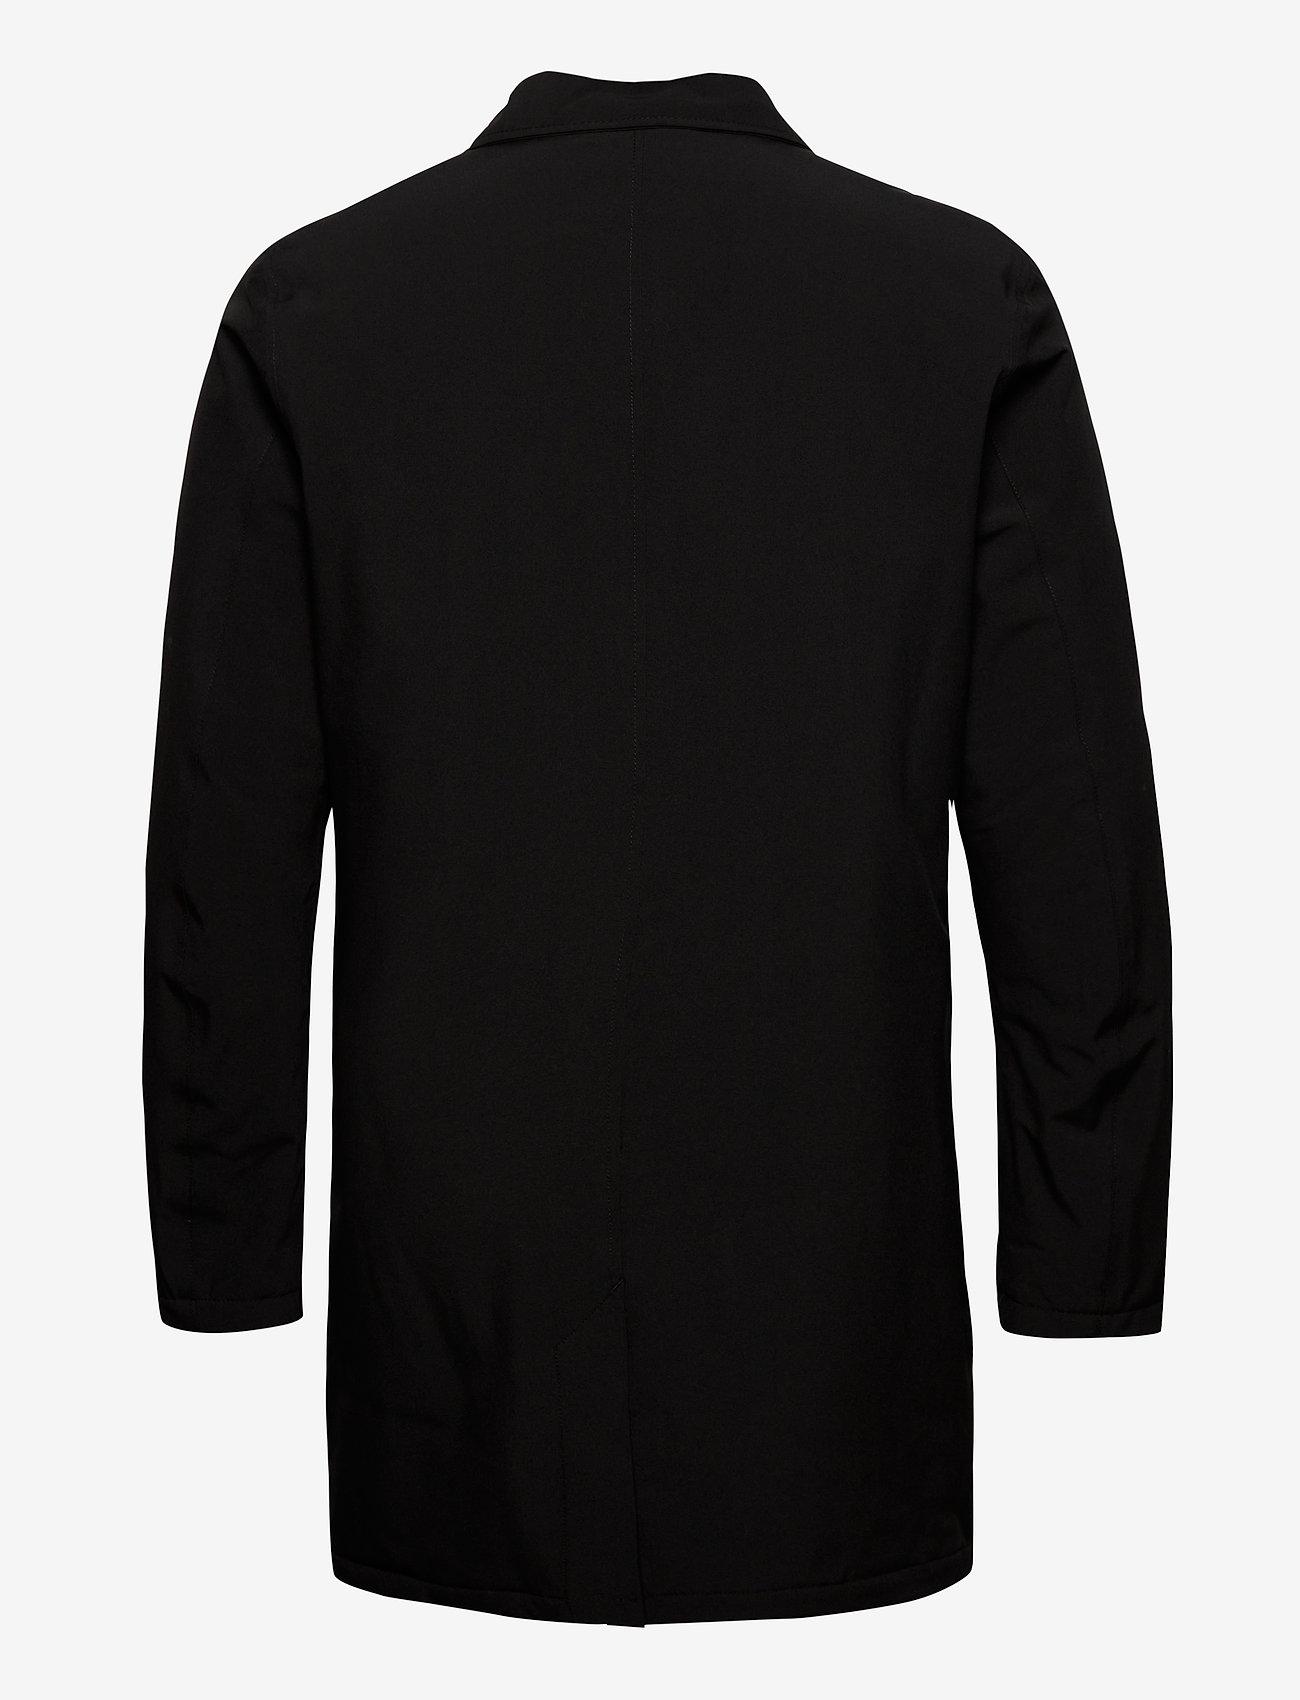 Lindbergh - Technical mac coat - kevyet päällystakit - black - 1